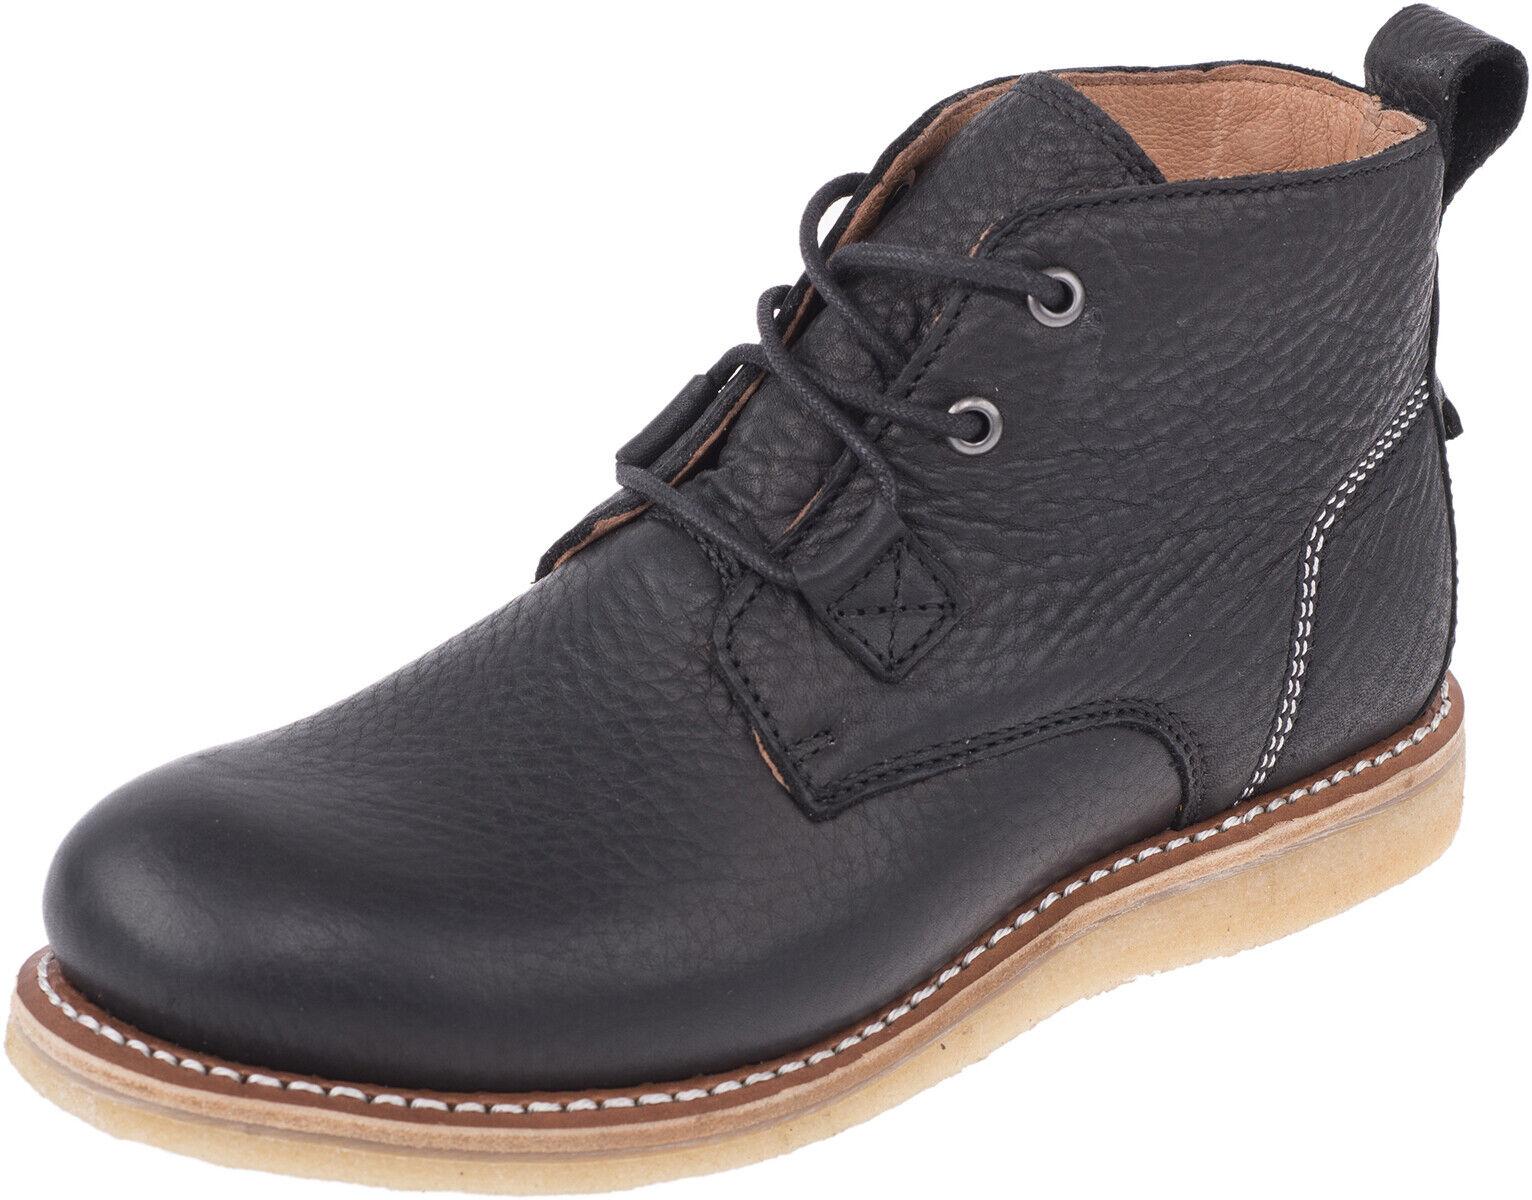 Dickies OAK BROOK Desert Schuhe   Stiefel Schwarz Rockabilly